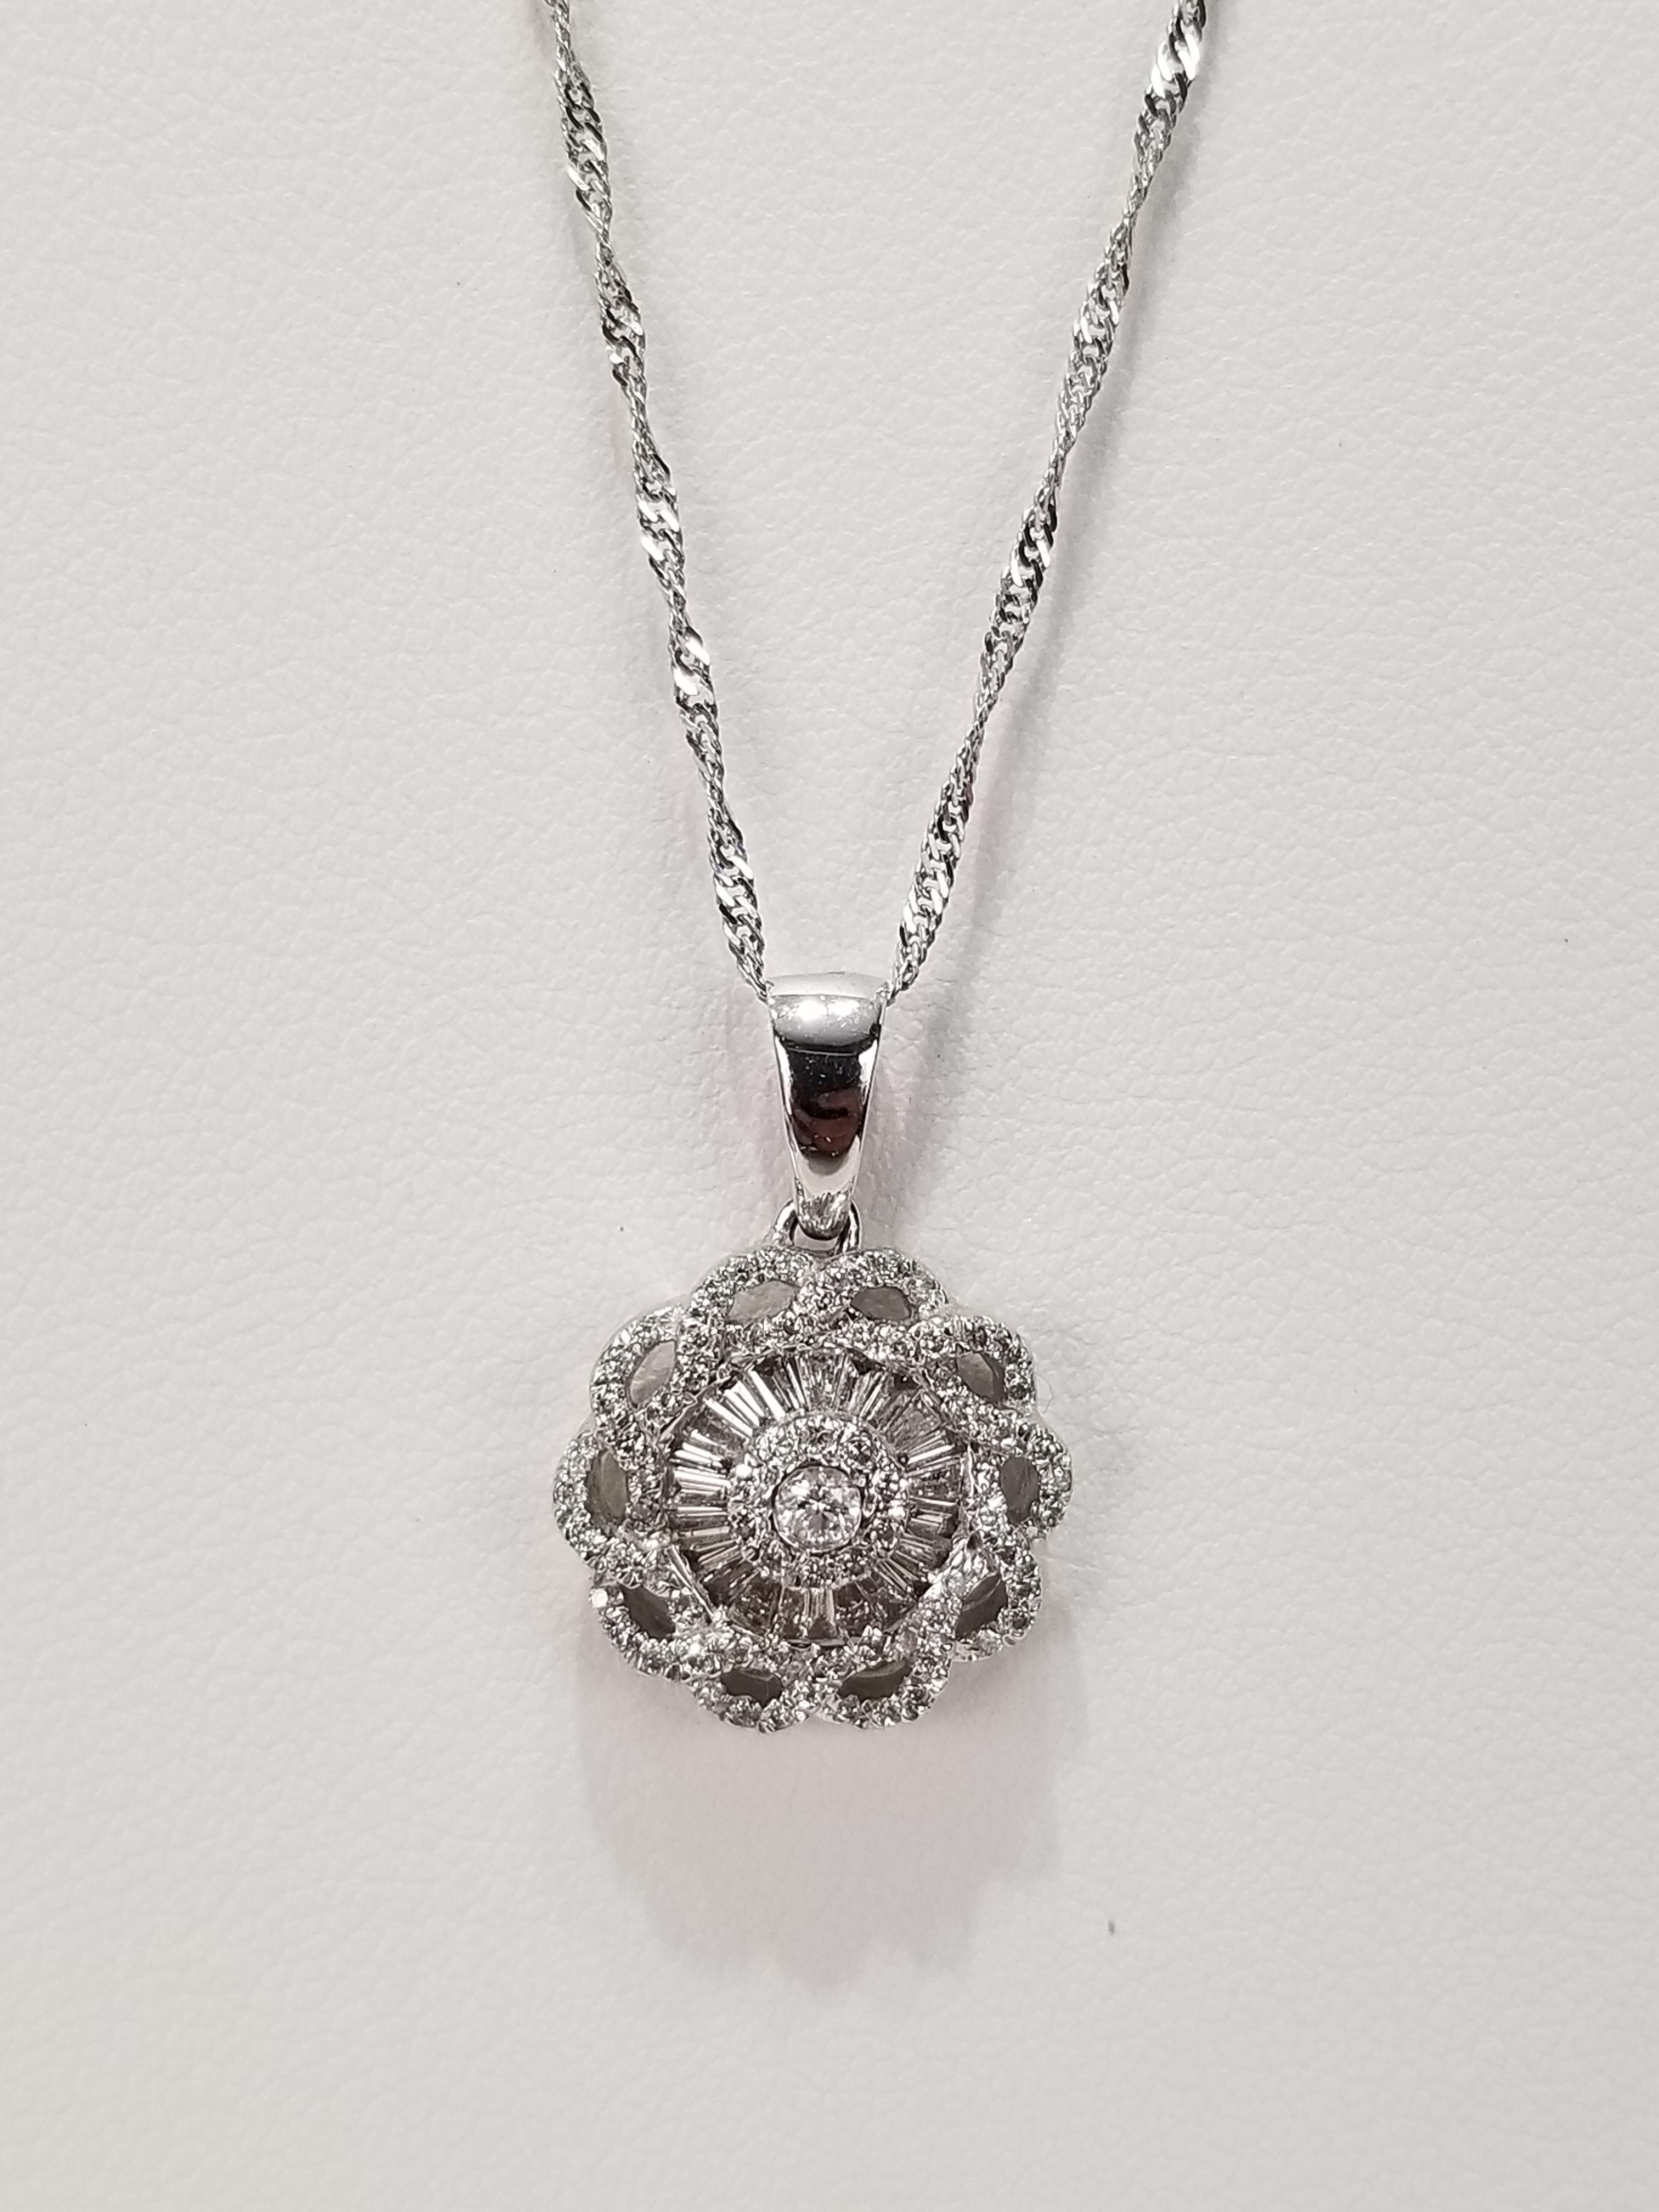 14K White Gold Diamonds 0.49ct Regular Price $2550 SALE $695 Ref HM651